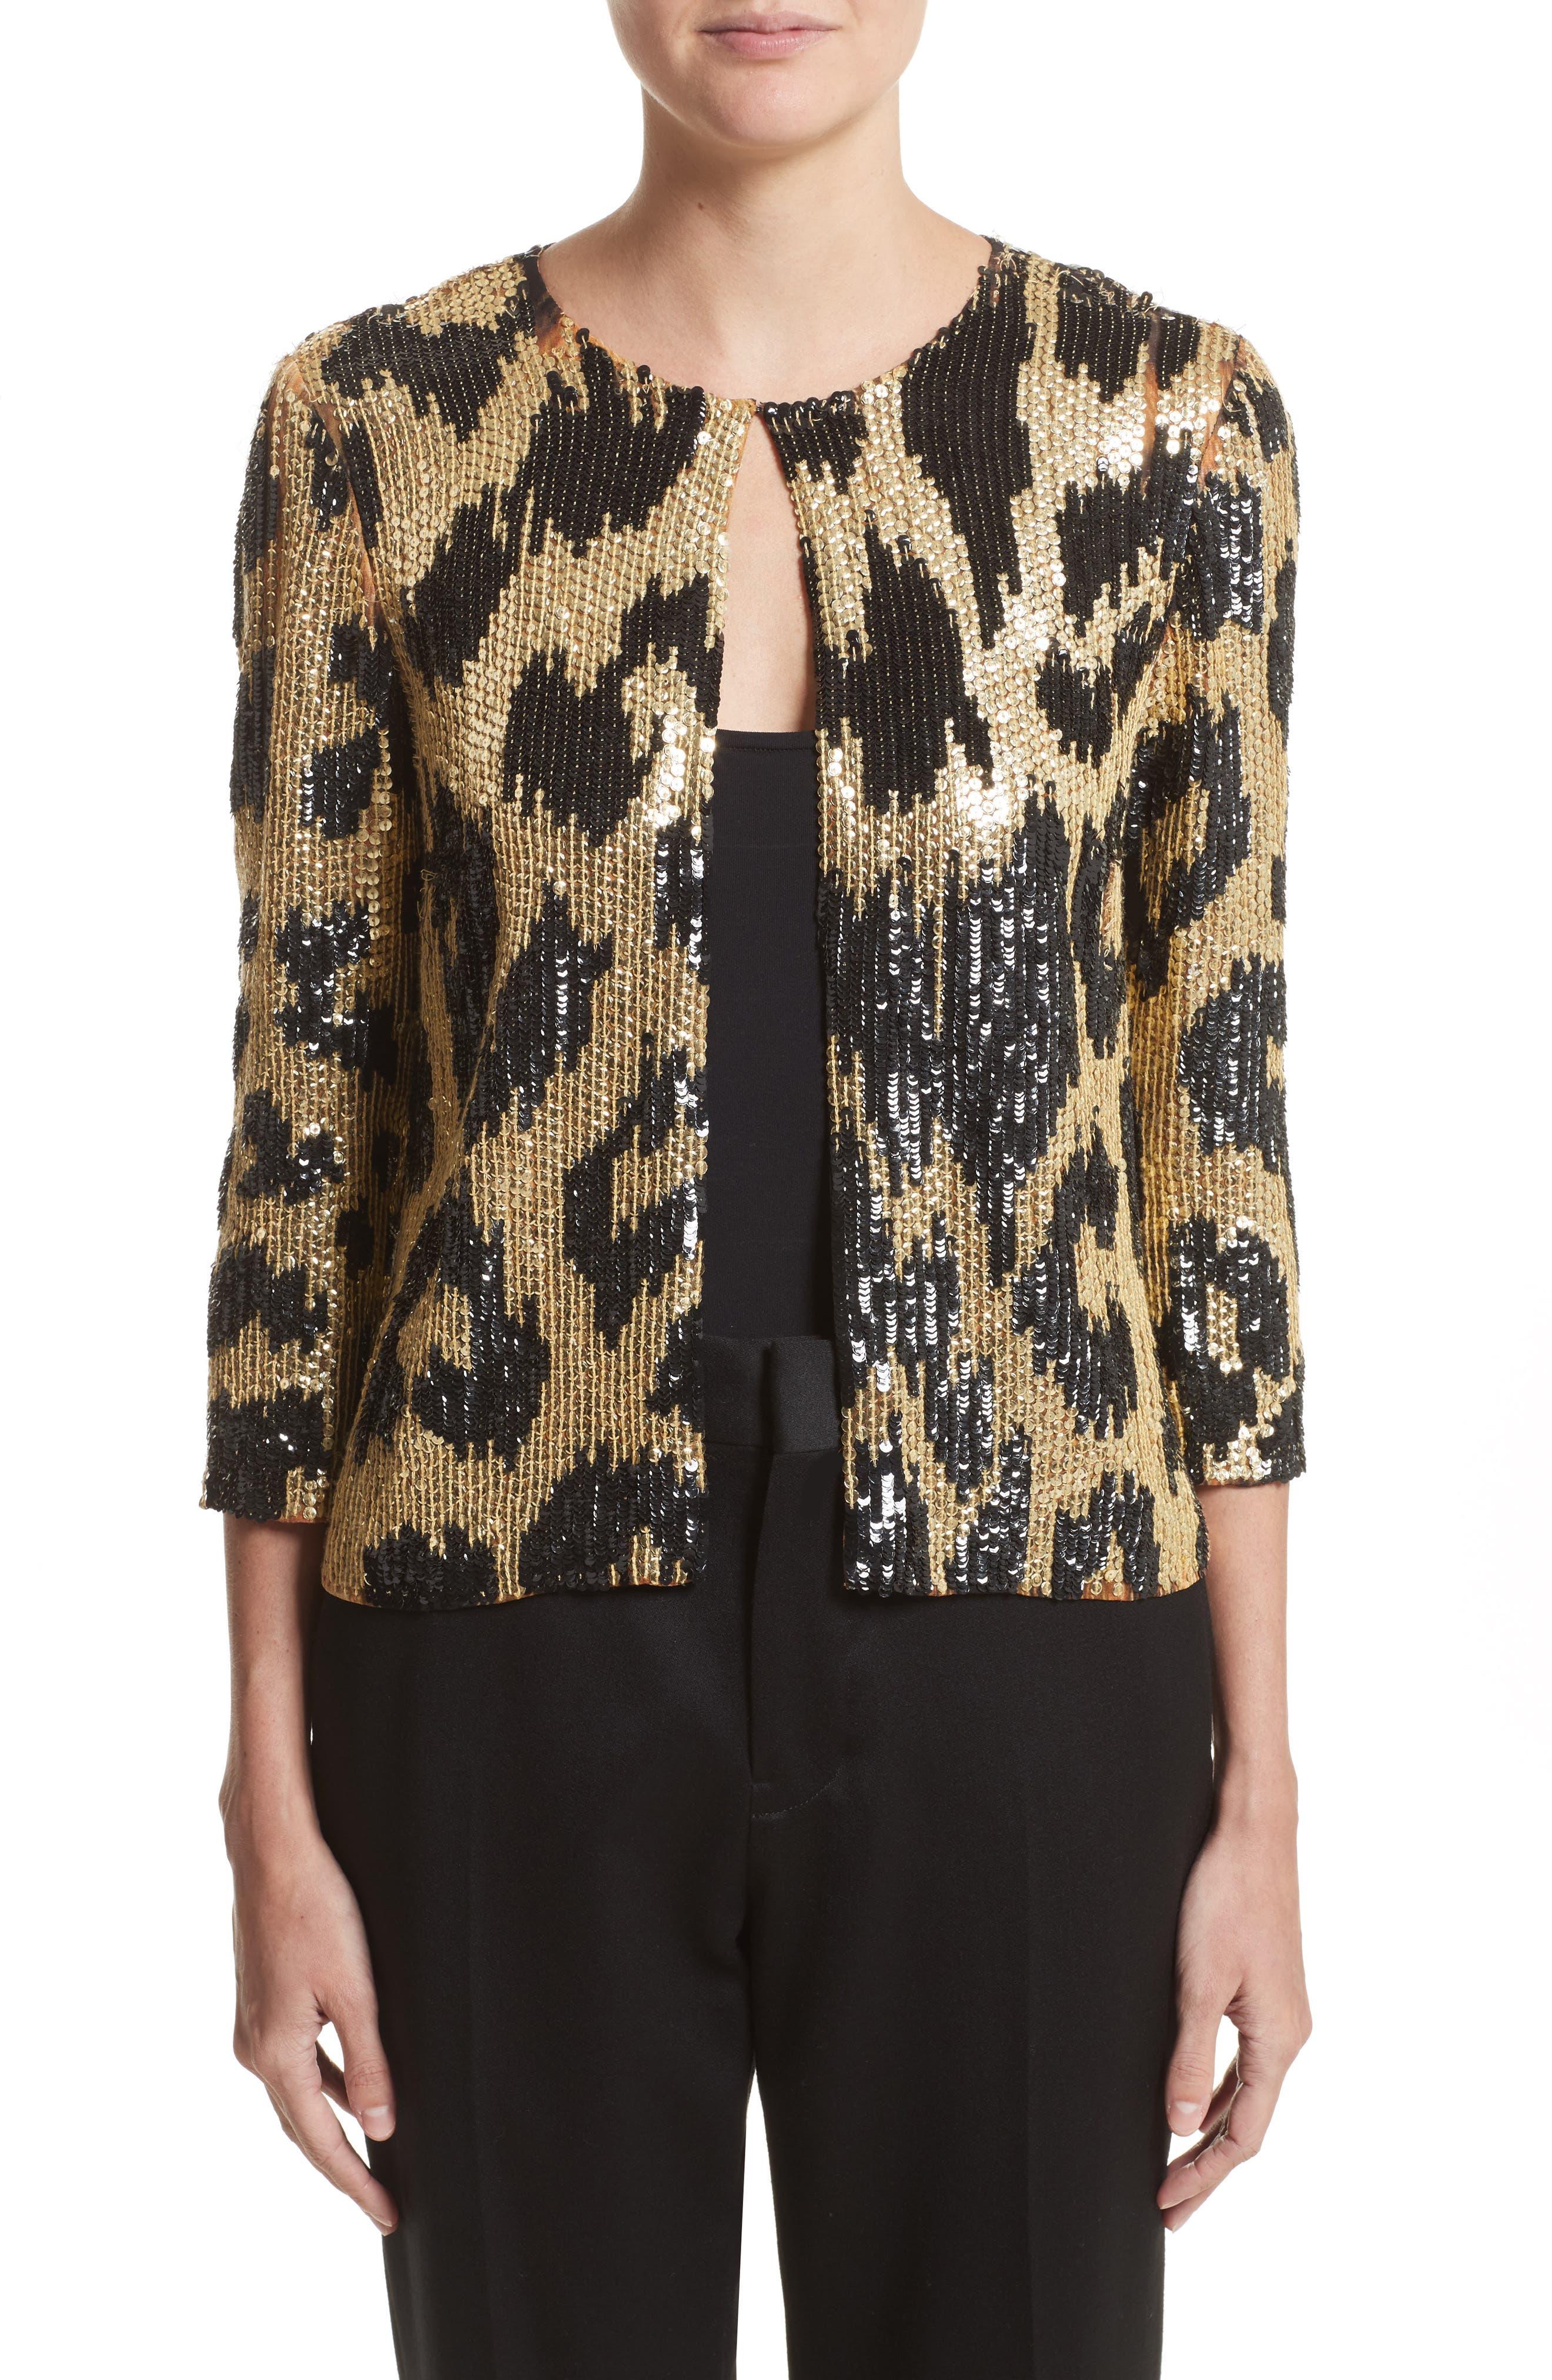 Naeem Khan Cheetah Print Sequin Jacket